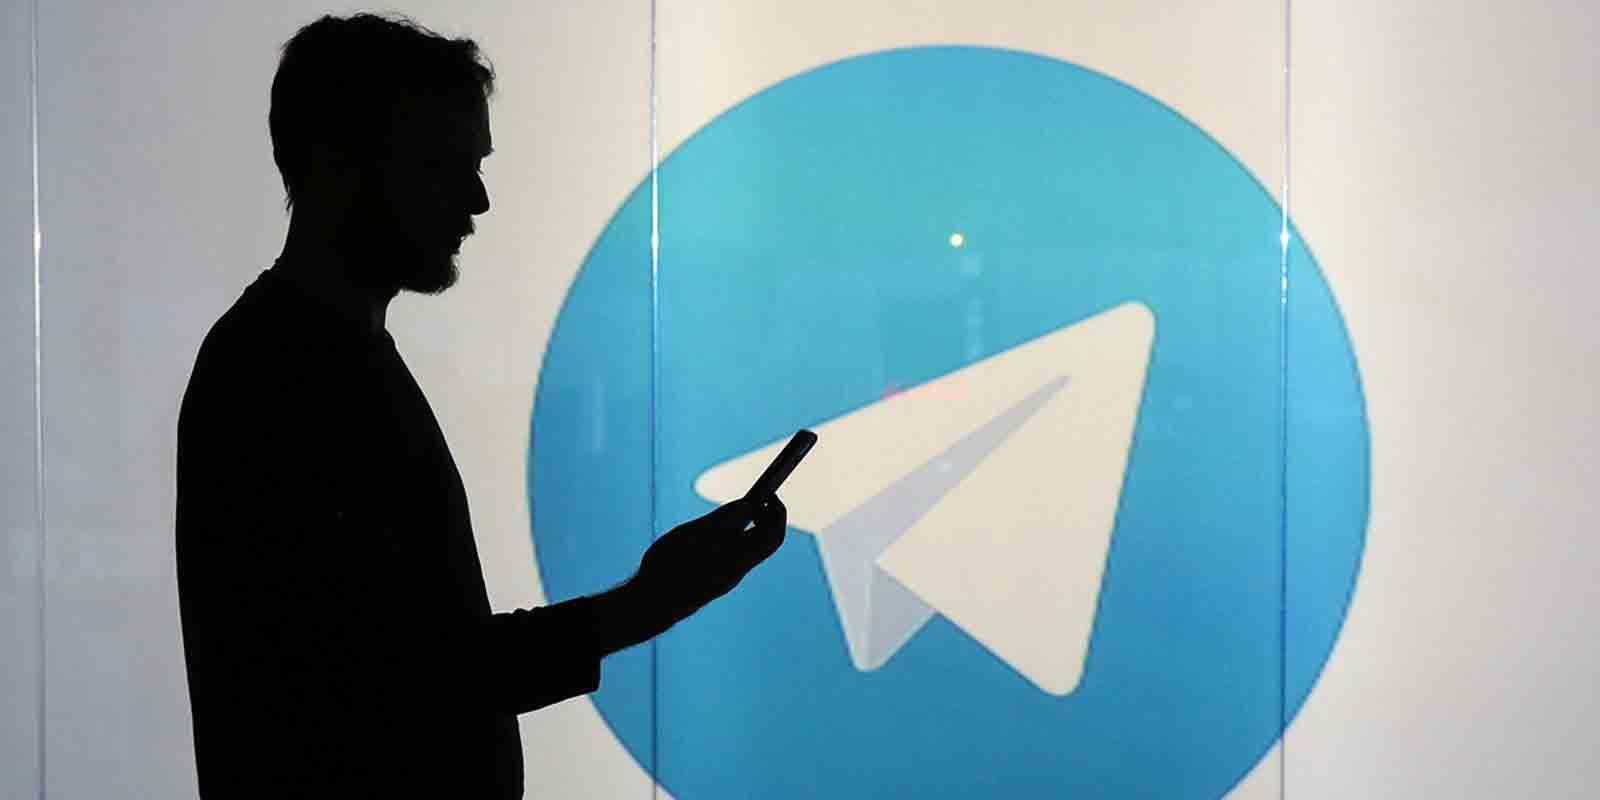 Contactos desconocidos en Telegram